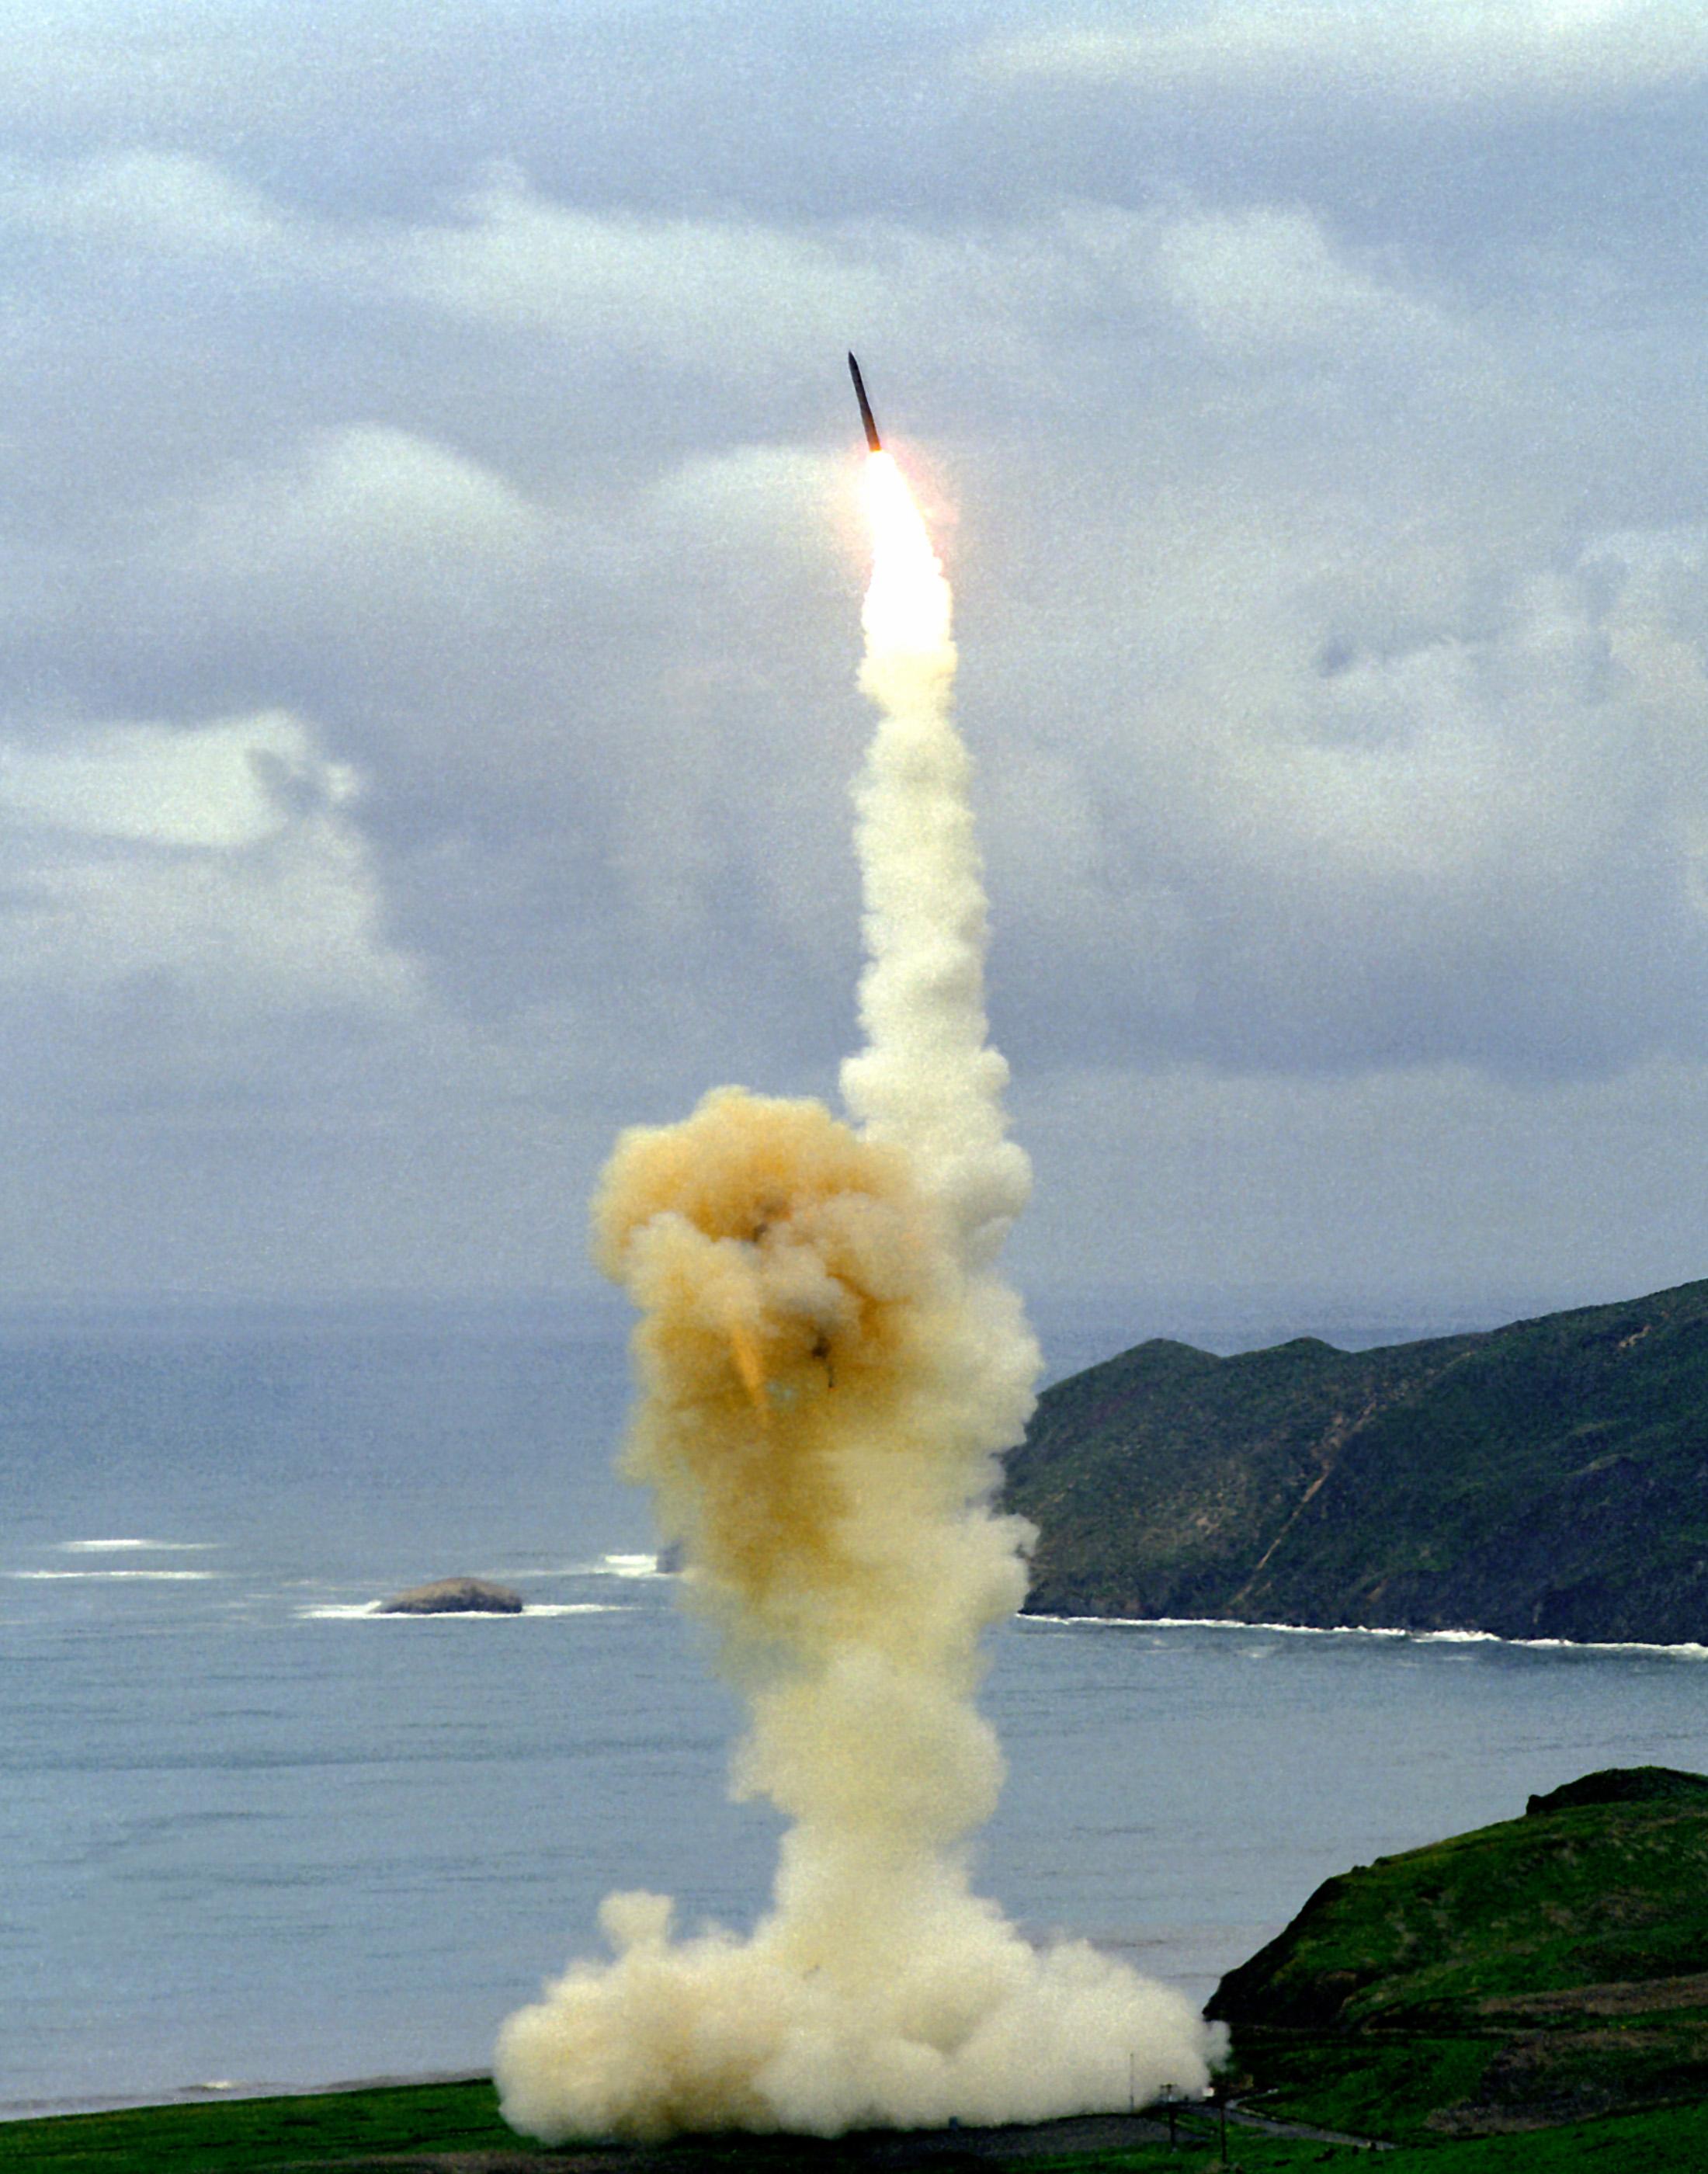 http---upload.wikimedia.org-wikipedia-commons-6-60-Minuteman3launch.jpg